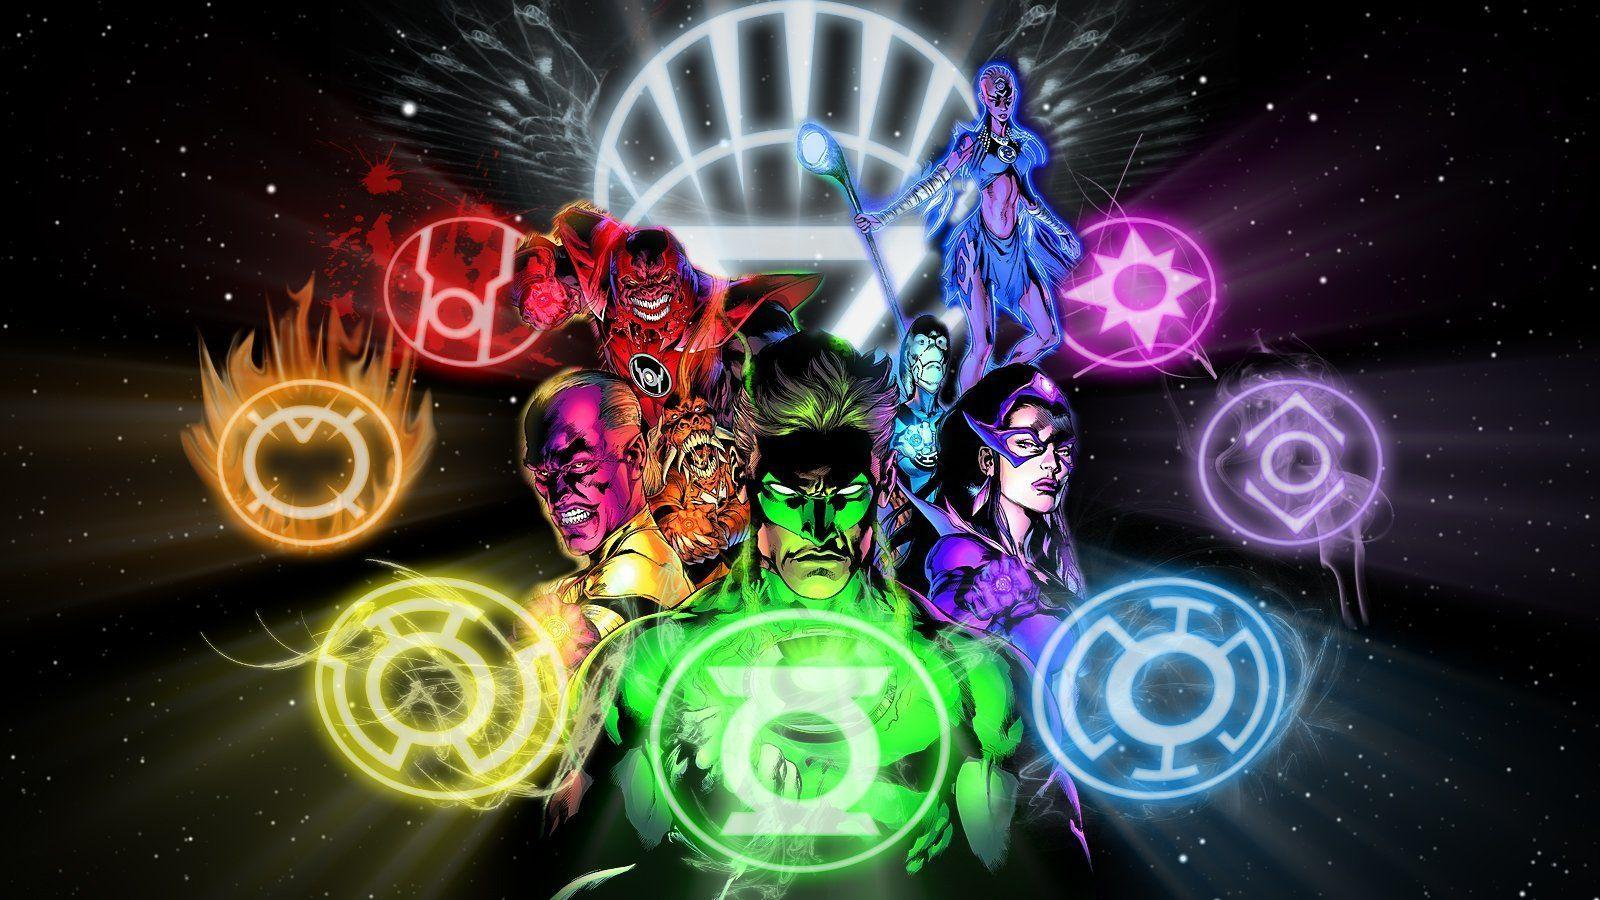 Green Lantern: Larfleeze Comic Wallpapers | WallpapersIn4k.net